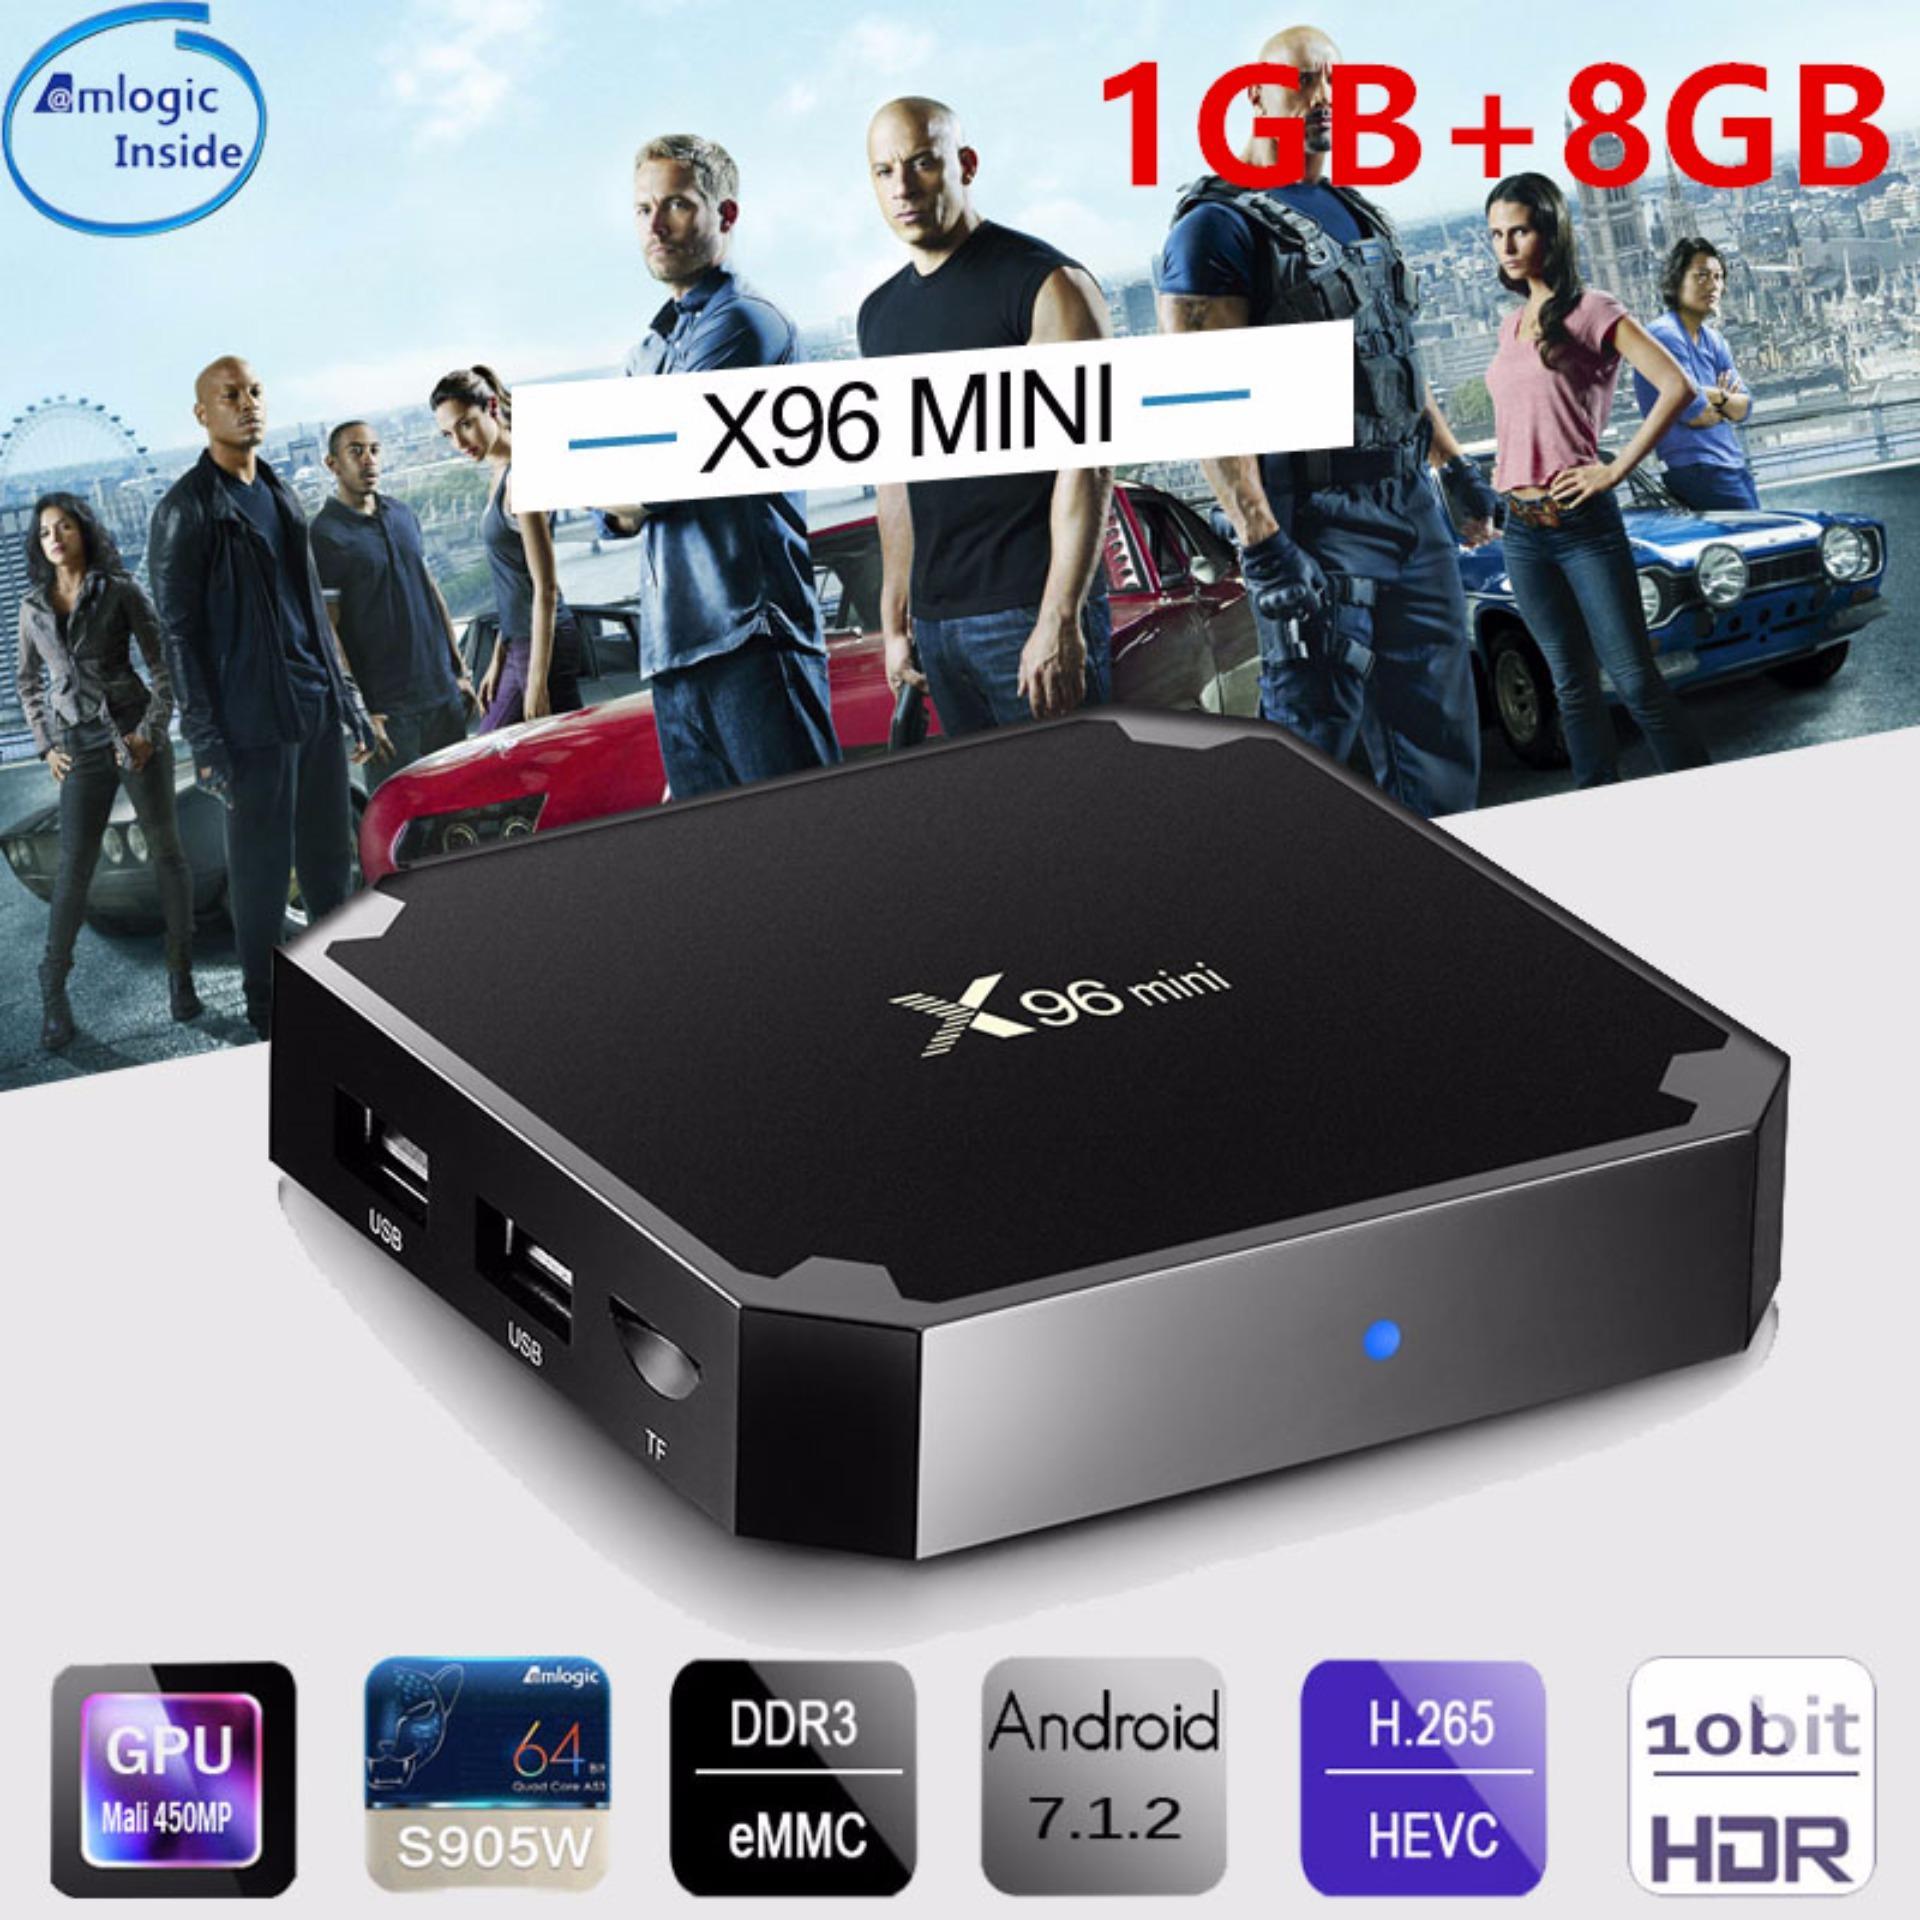 Video Streamer For Sale Media Prices Brands Specs In Android 71 Tv Box H96 Pro Plus Ram 3gb Rom 32gb Kodi Loaded New X96 Mini Smart Player 1 2gb 8 16gb Amlogic S905w Quad